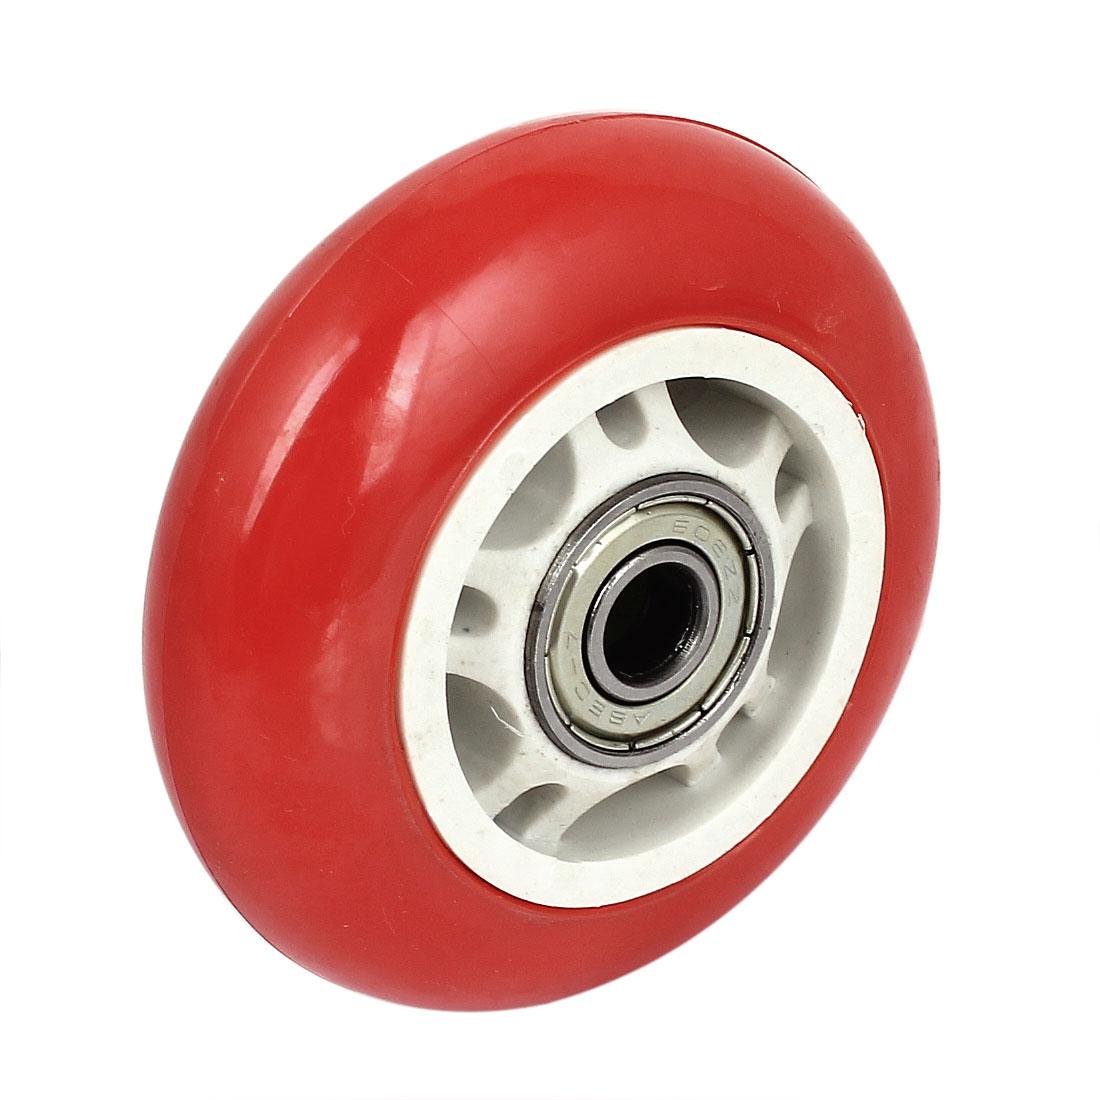 Skateboard Skating Shoes 608ZZ Bearing Inline Wheel Roller Red 68mm Diameter